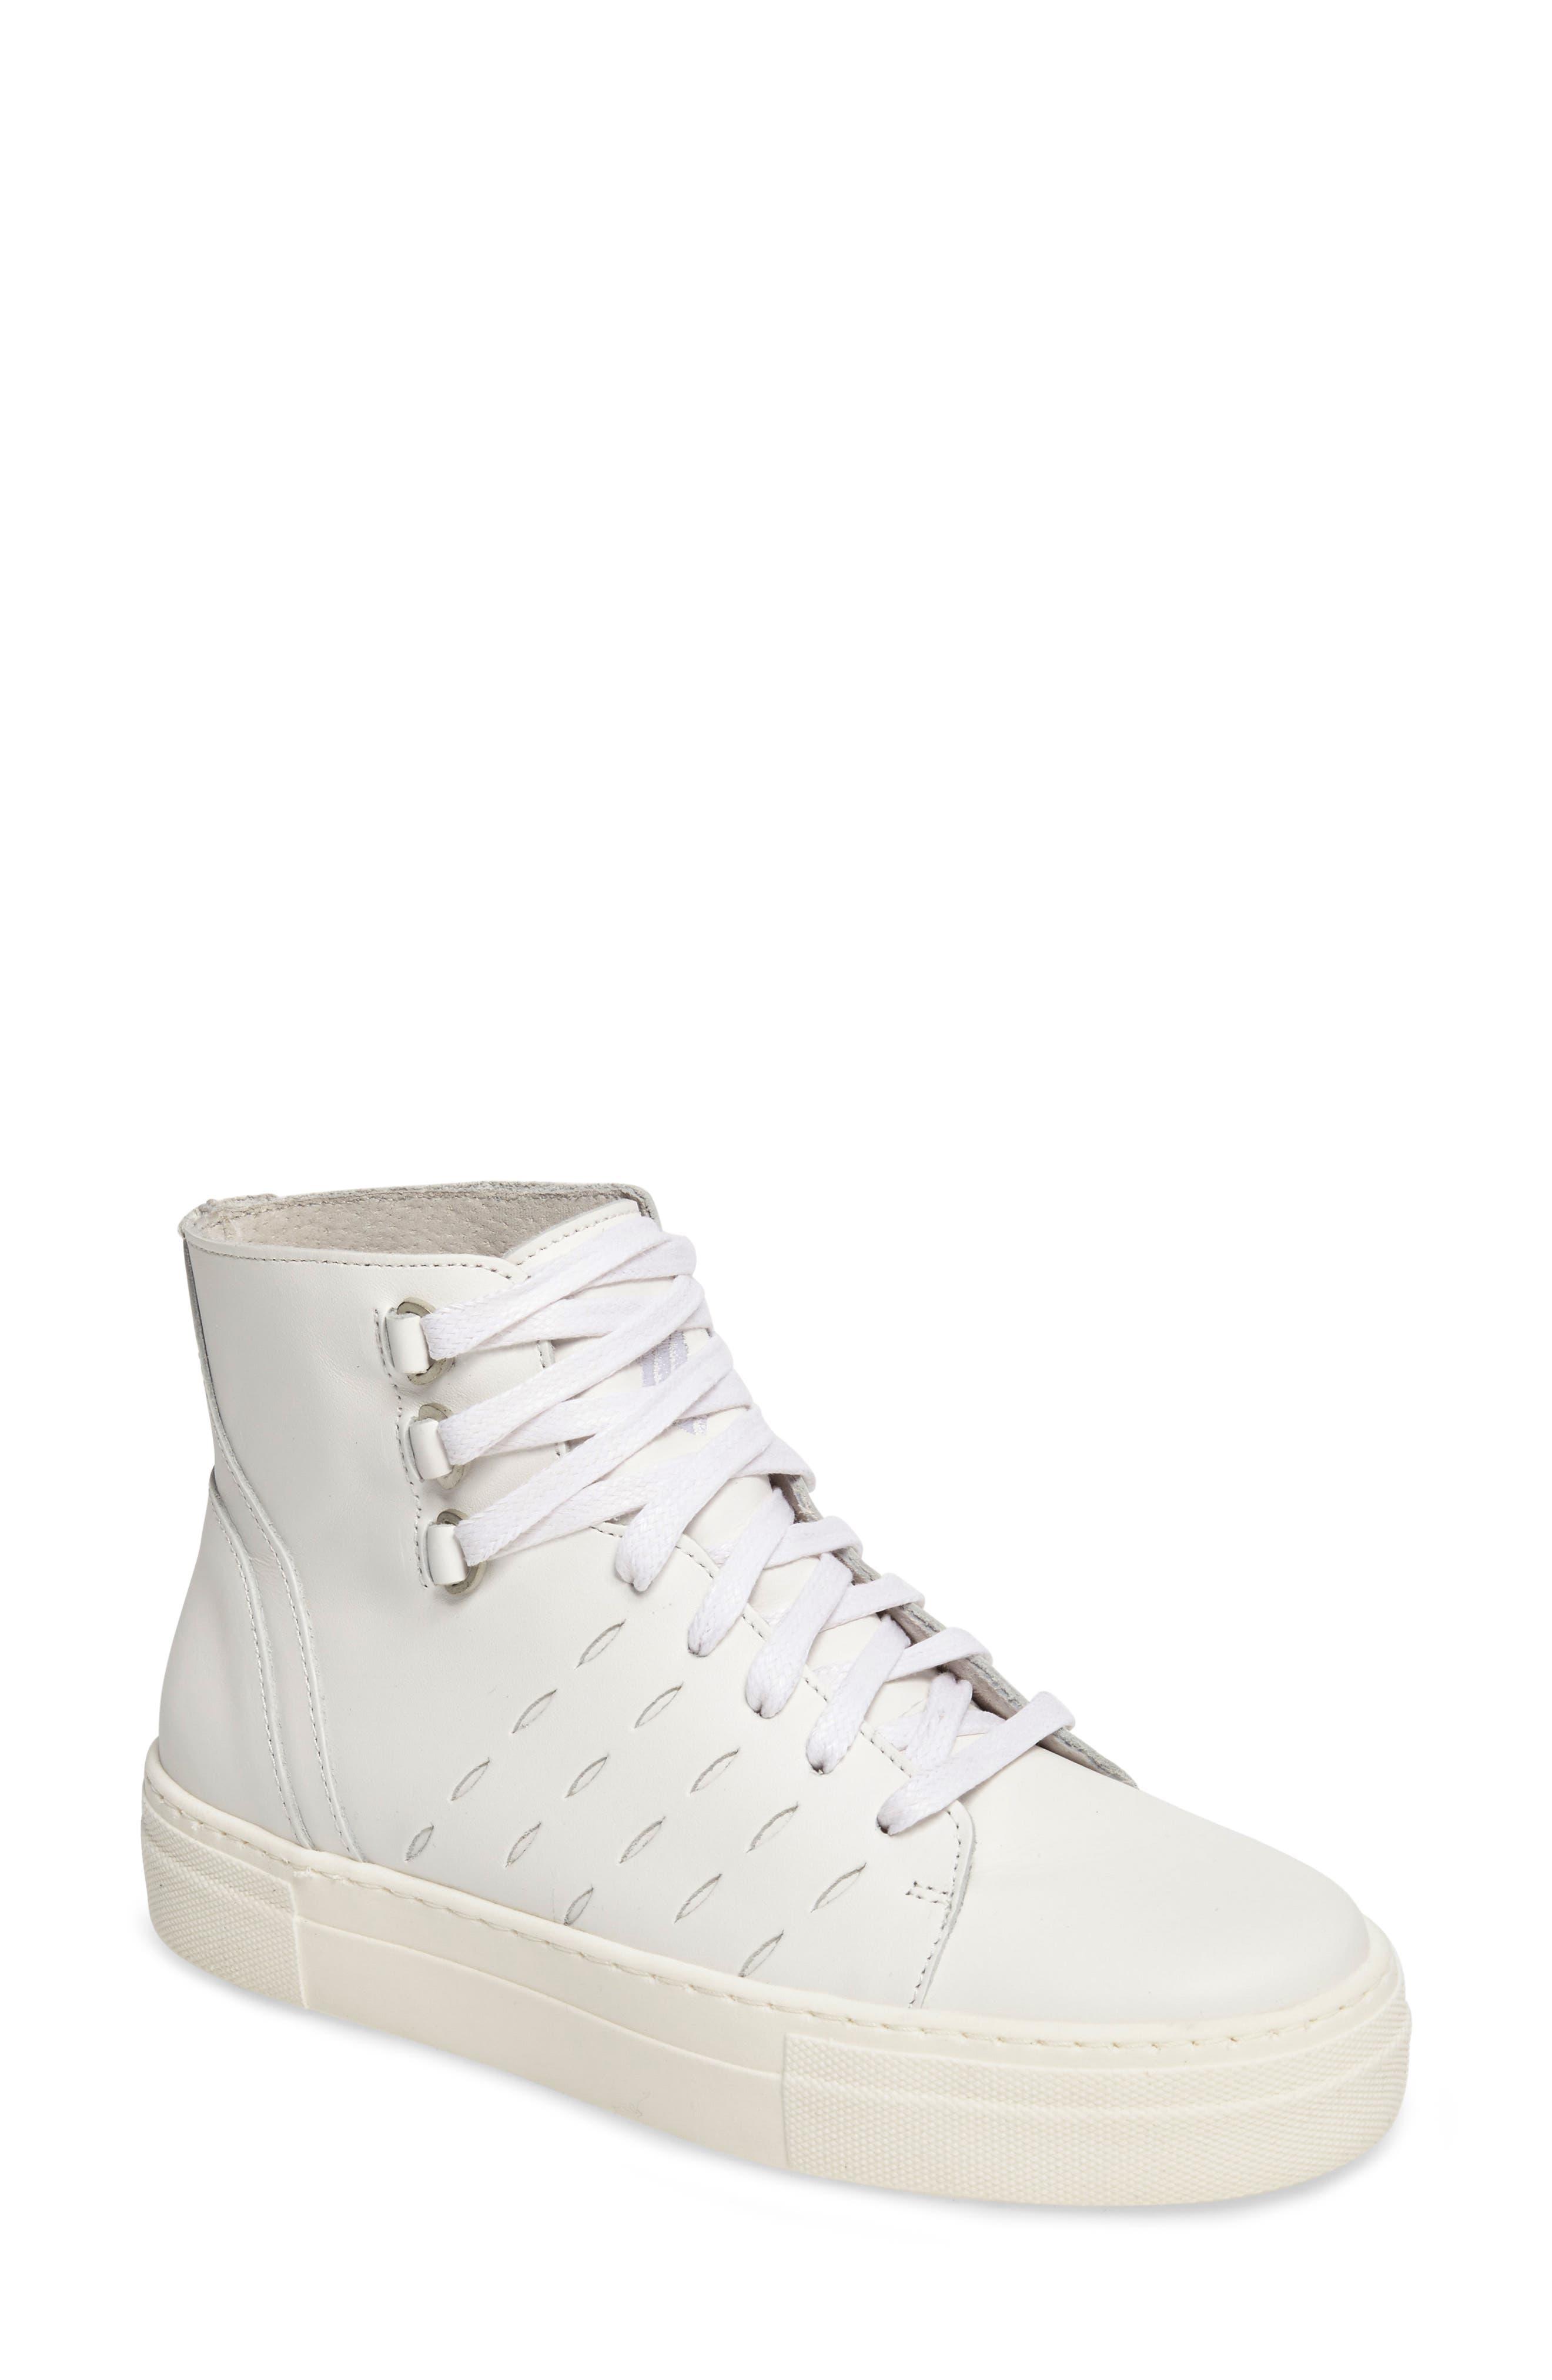 Alternate Image 1 Selected - K-Swiss Modern High Top Sneaker (Women)